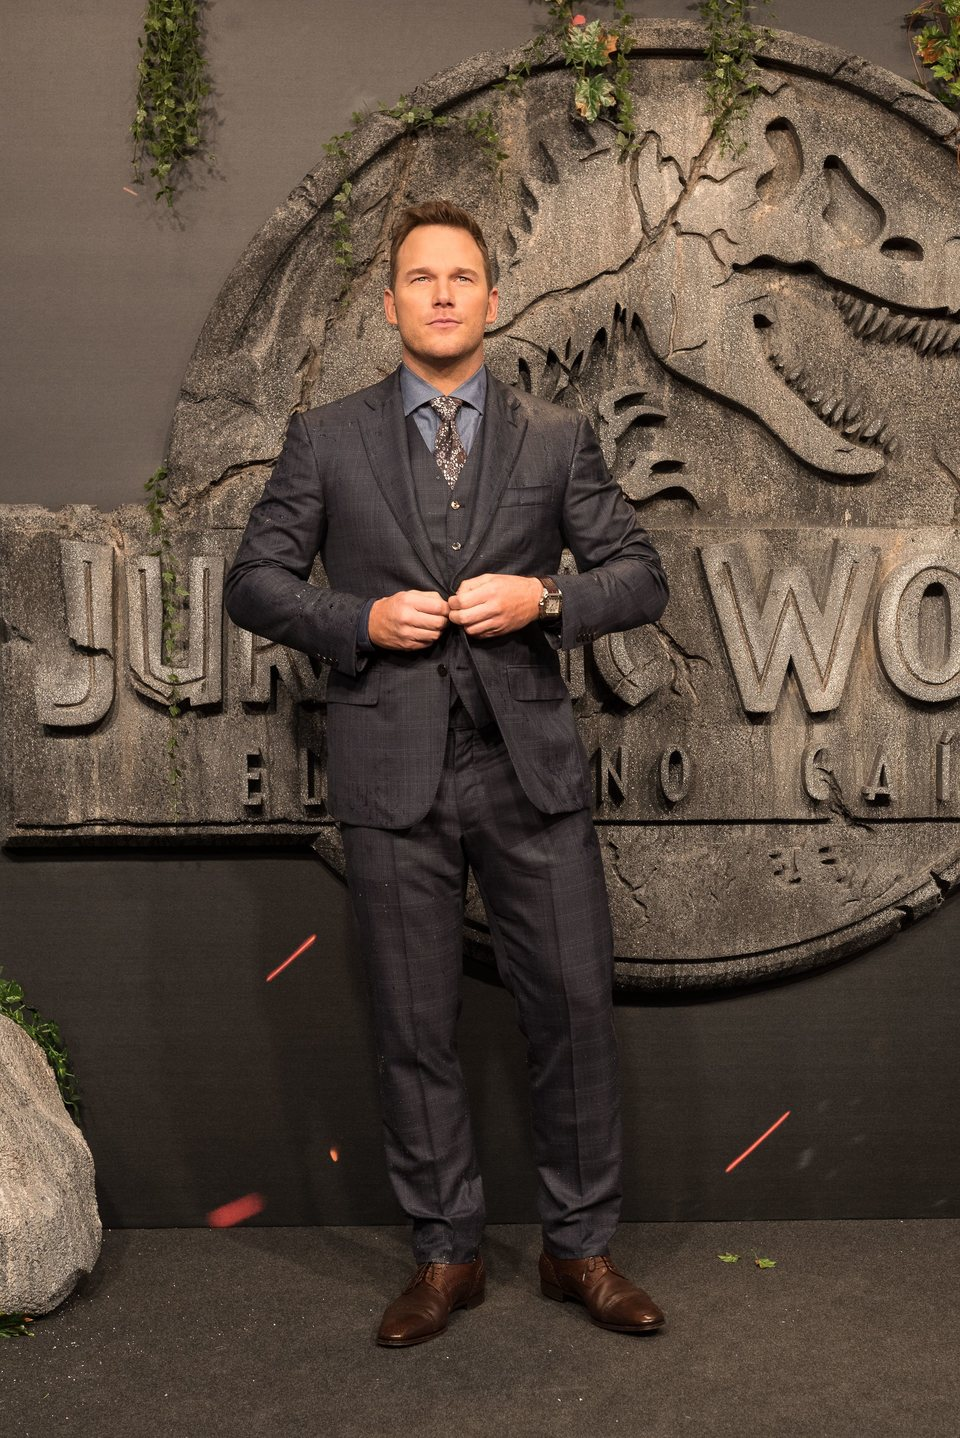 Chris Pratt at the 'Jurassic World: Fallen Kingdom' world premiere in Madrid